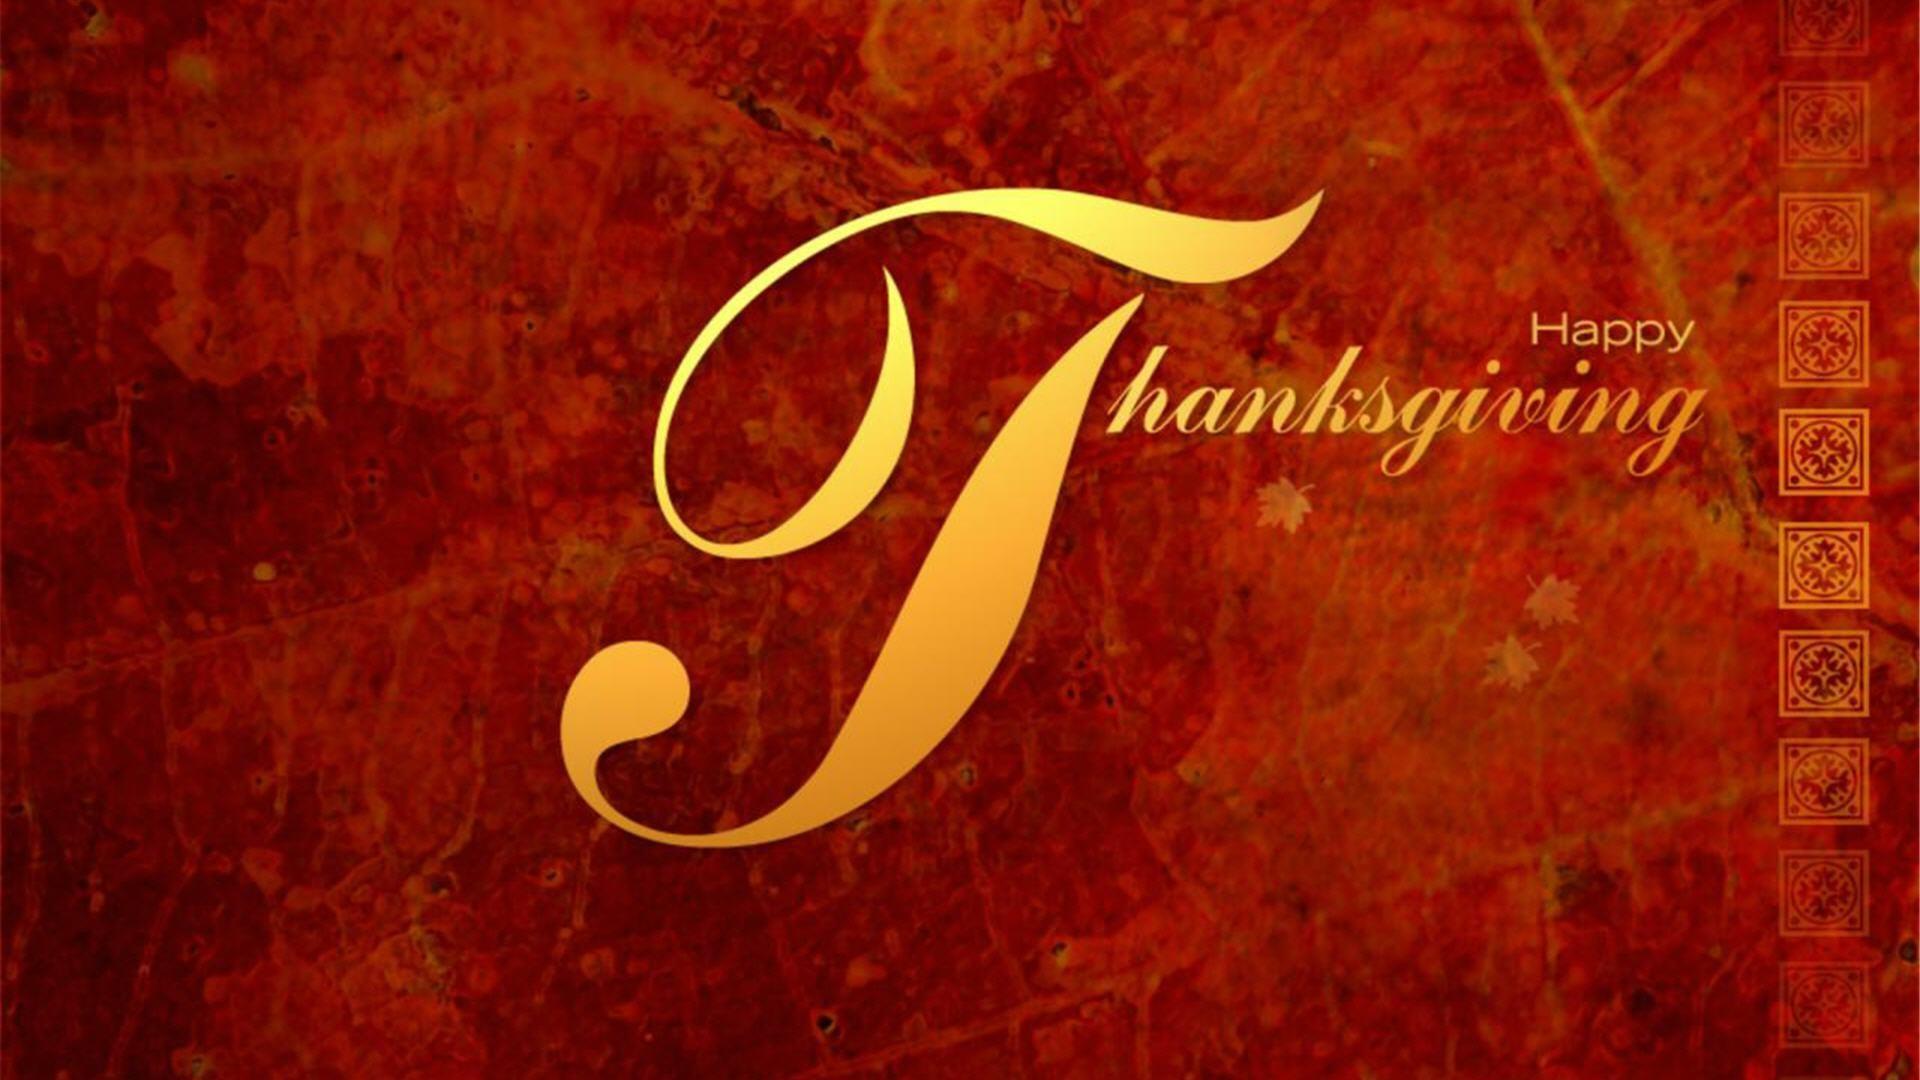 thanksgiving wallpapers download. Â«Â«